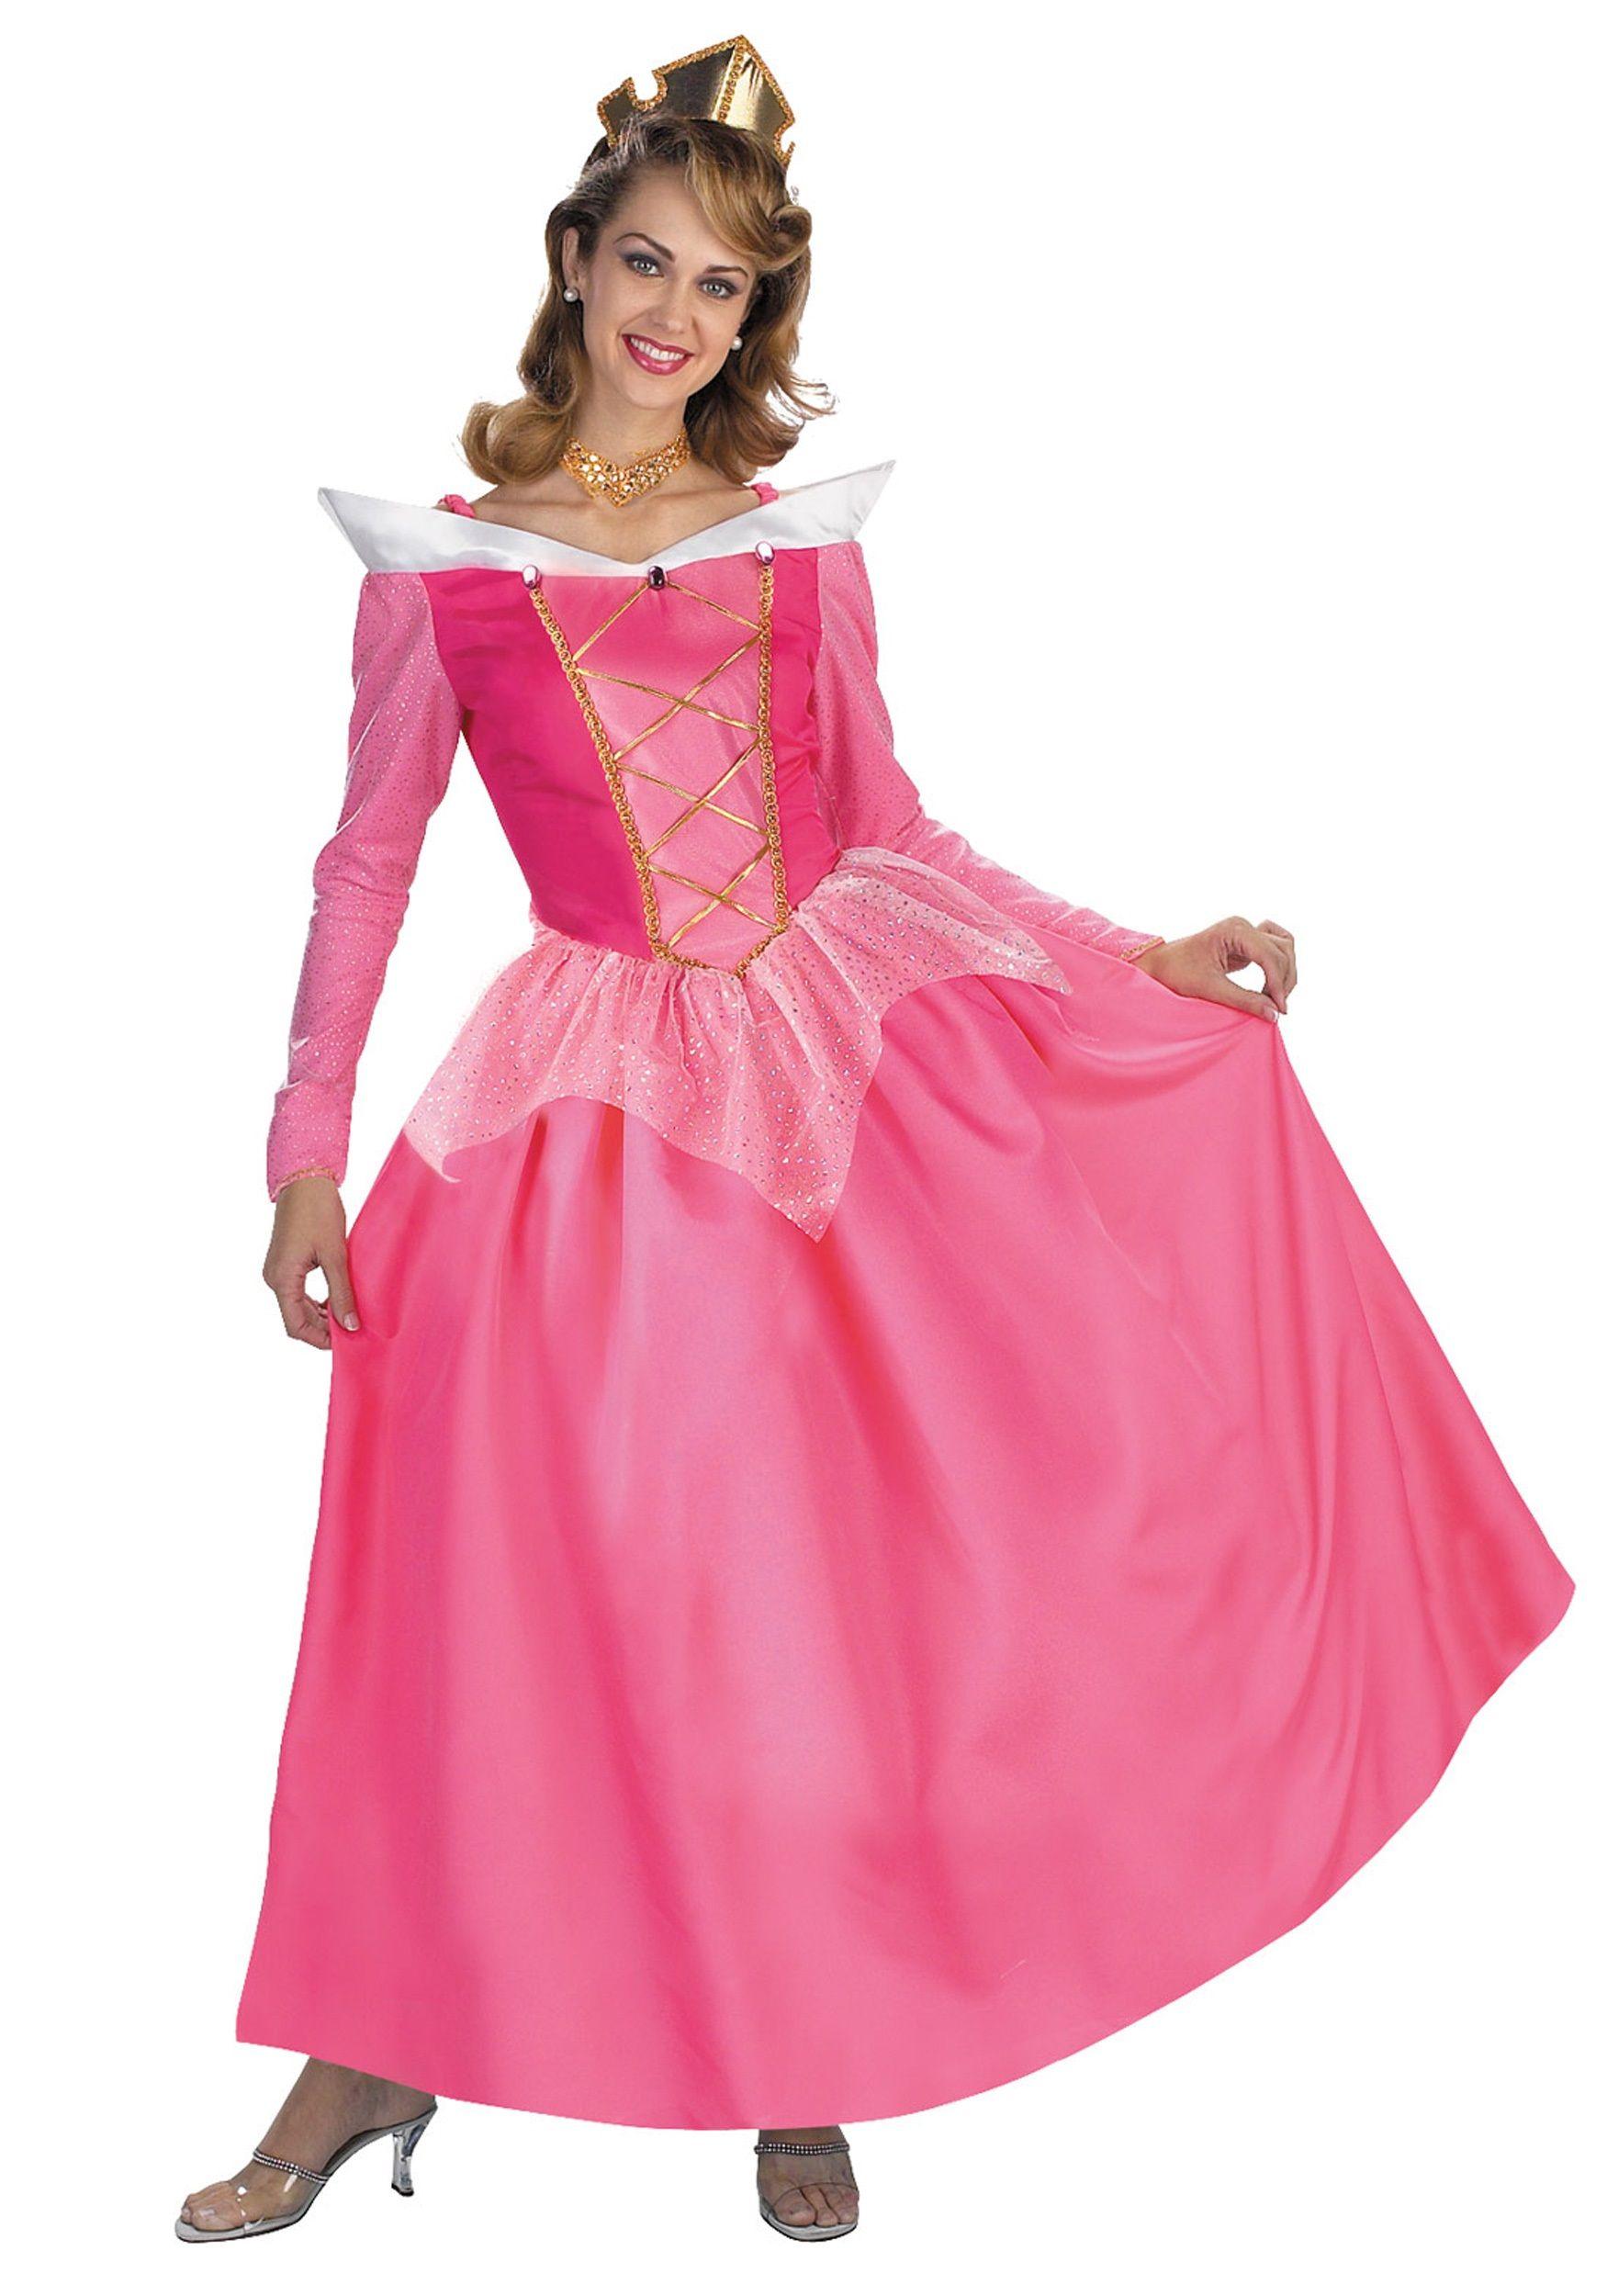 Sleeping Beauty Shrek Princess Blue Gown Fancy Dress Up Halloween Child Costume